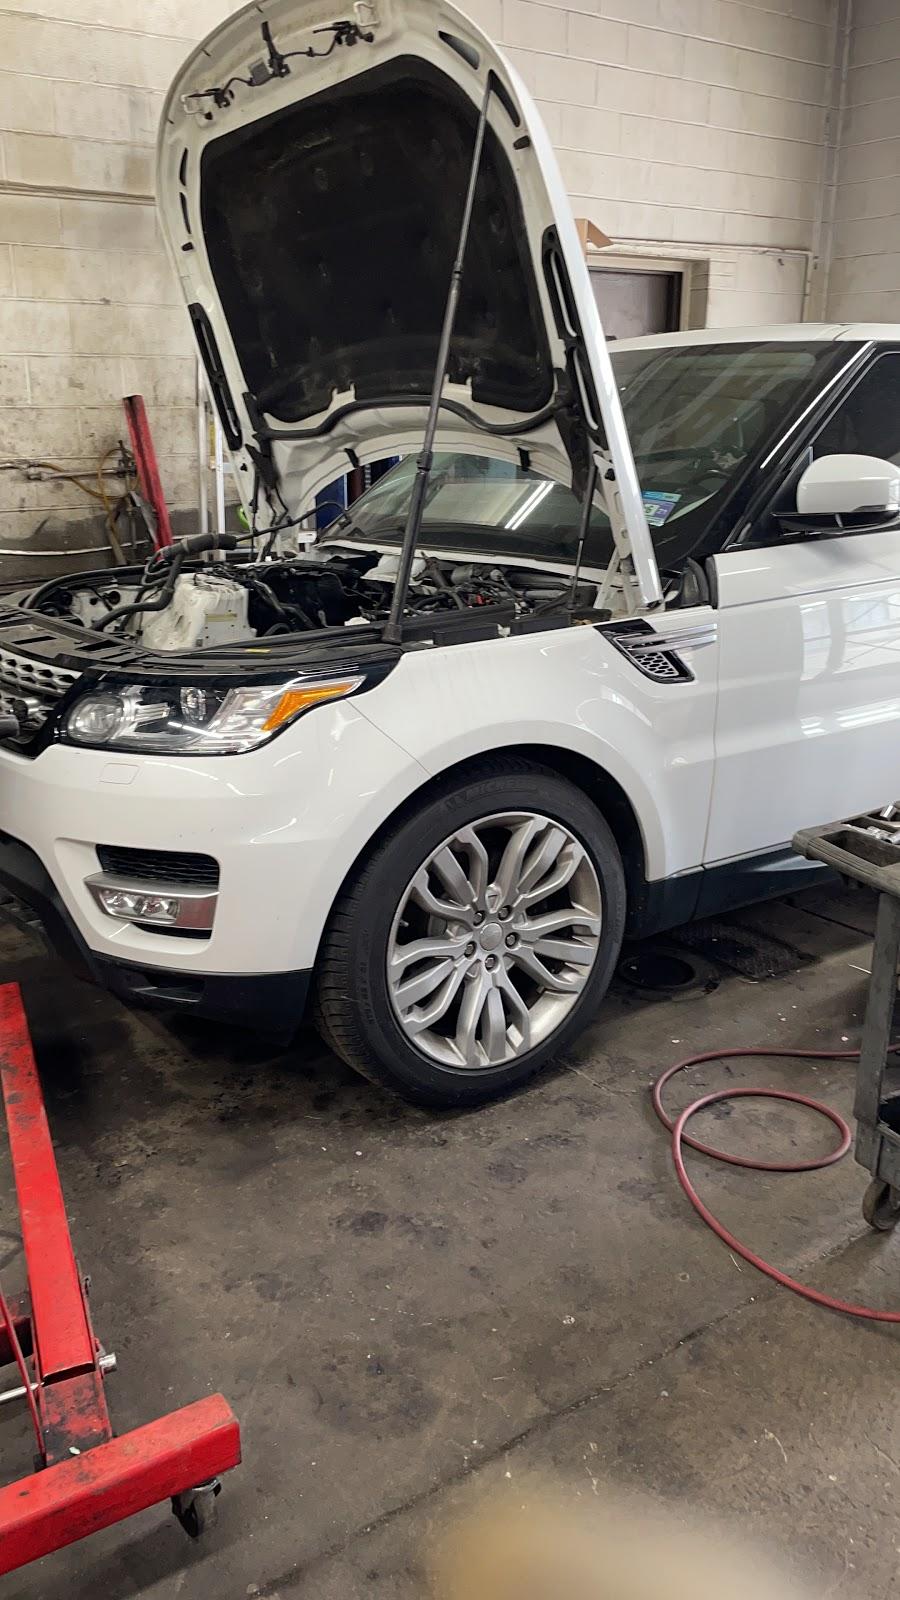 MP Performances Mechanic - car repair    Photo 7 of 10   Address: 130 S State St, Hackensack, NJ 07601, USA   Phone: (201) 667-5189